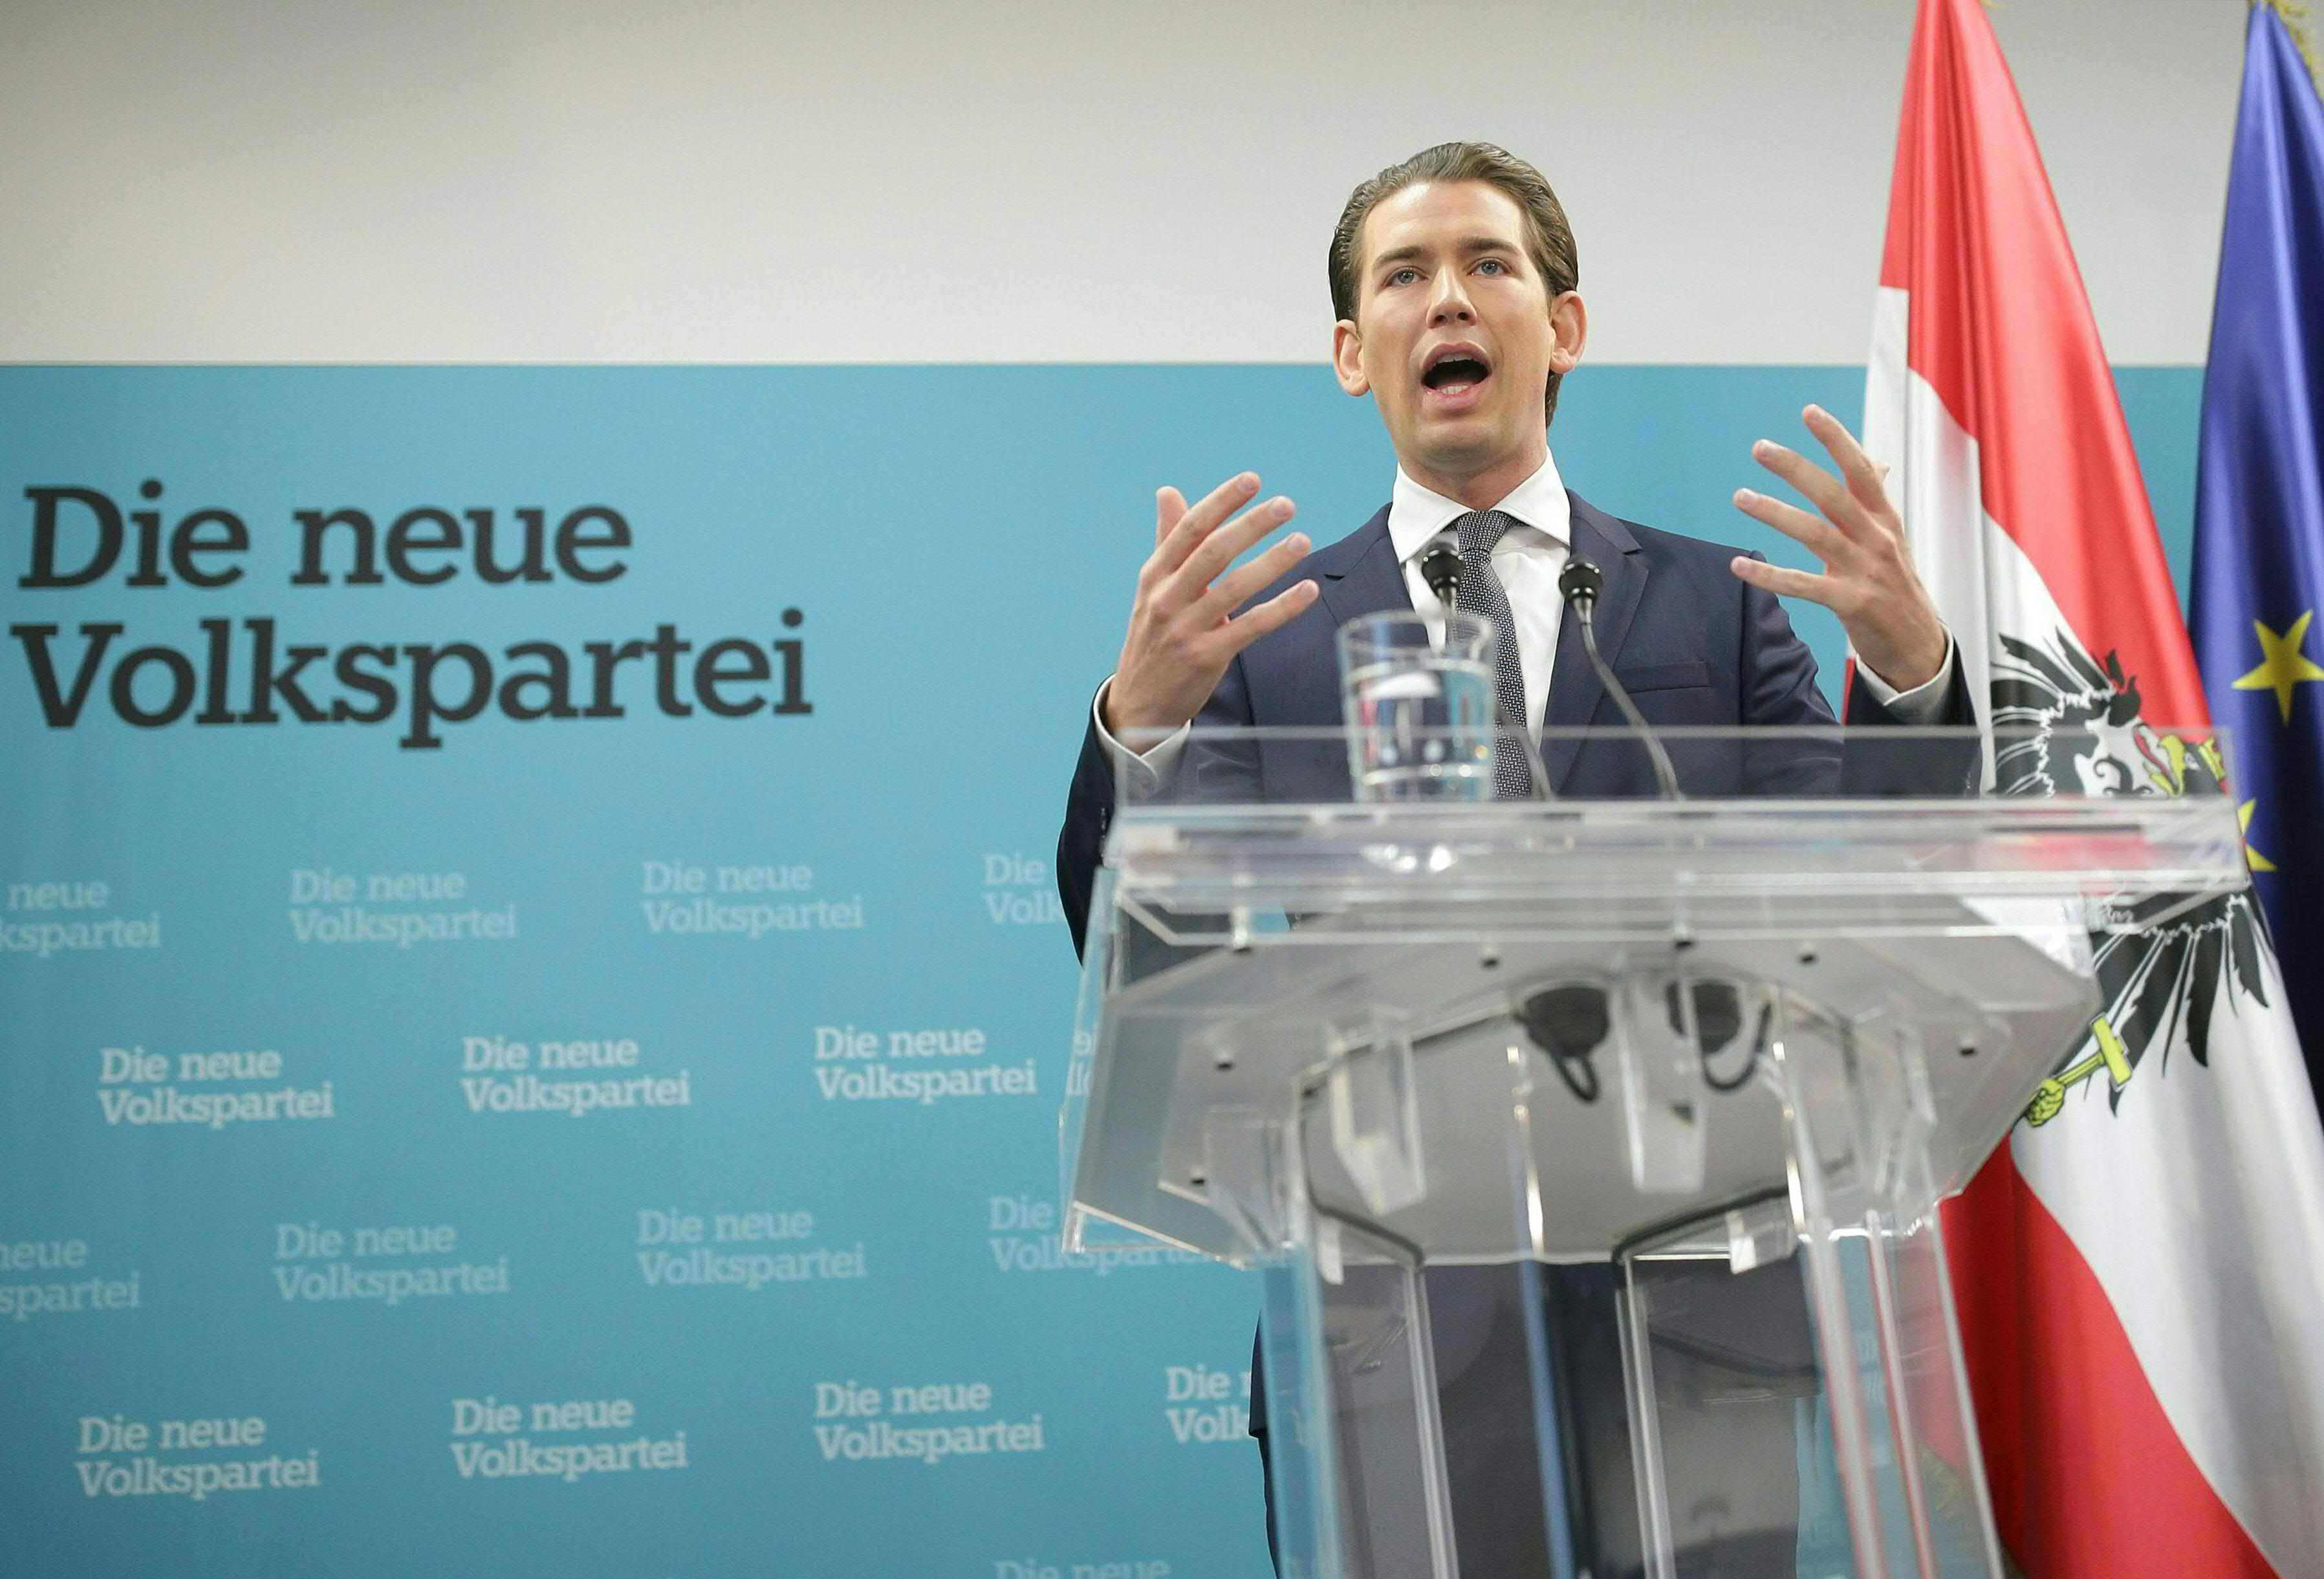 Conservador convida extrema-direita para governo na Áustria